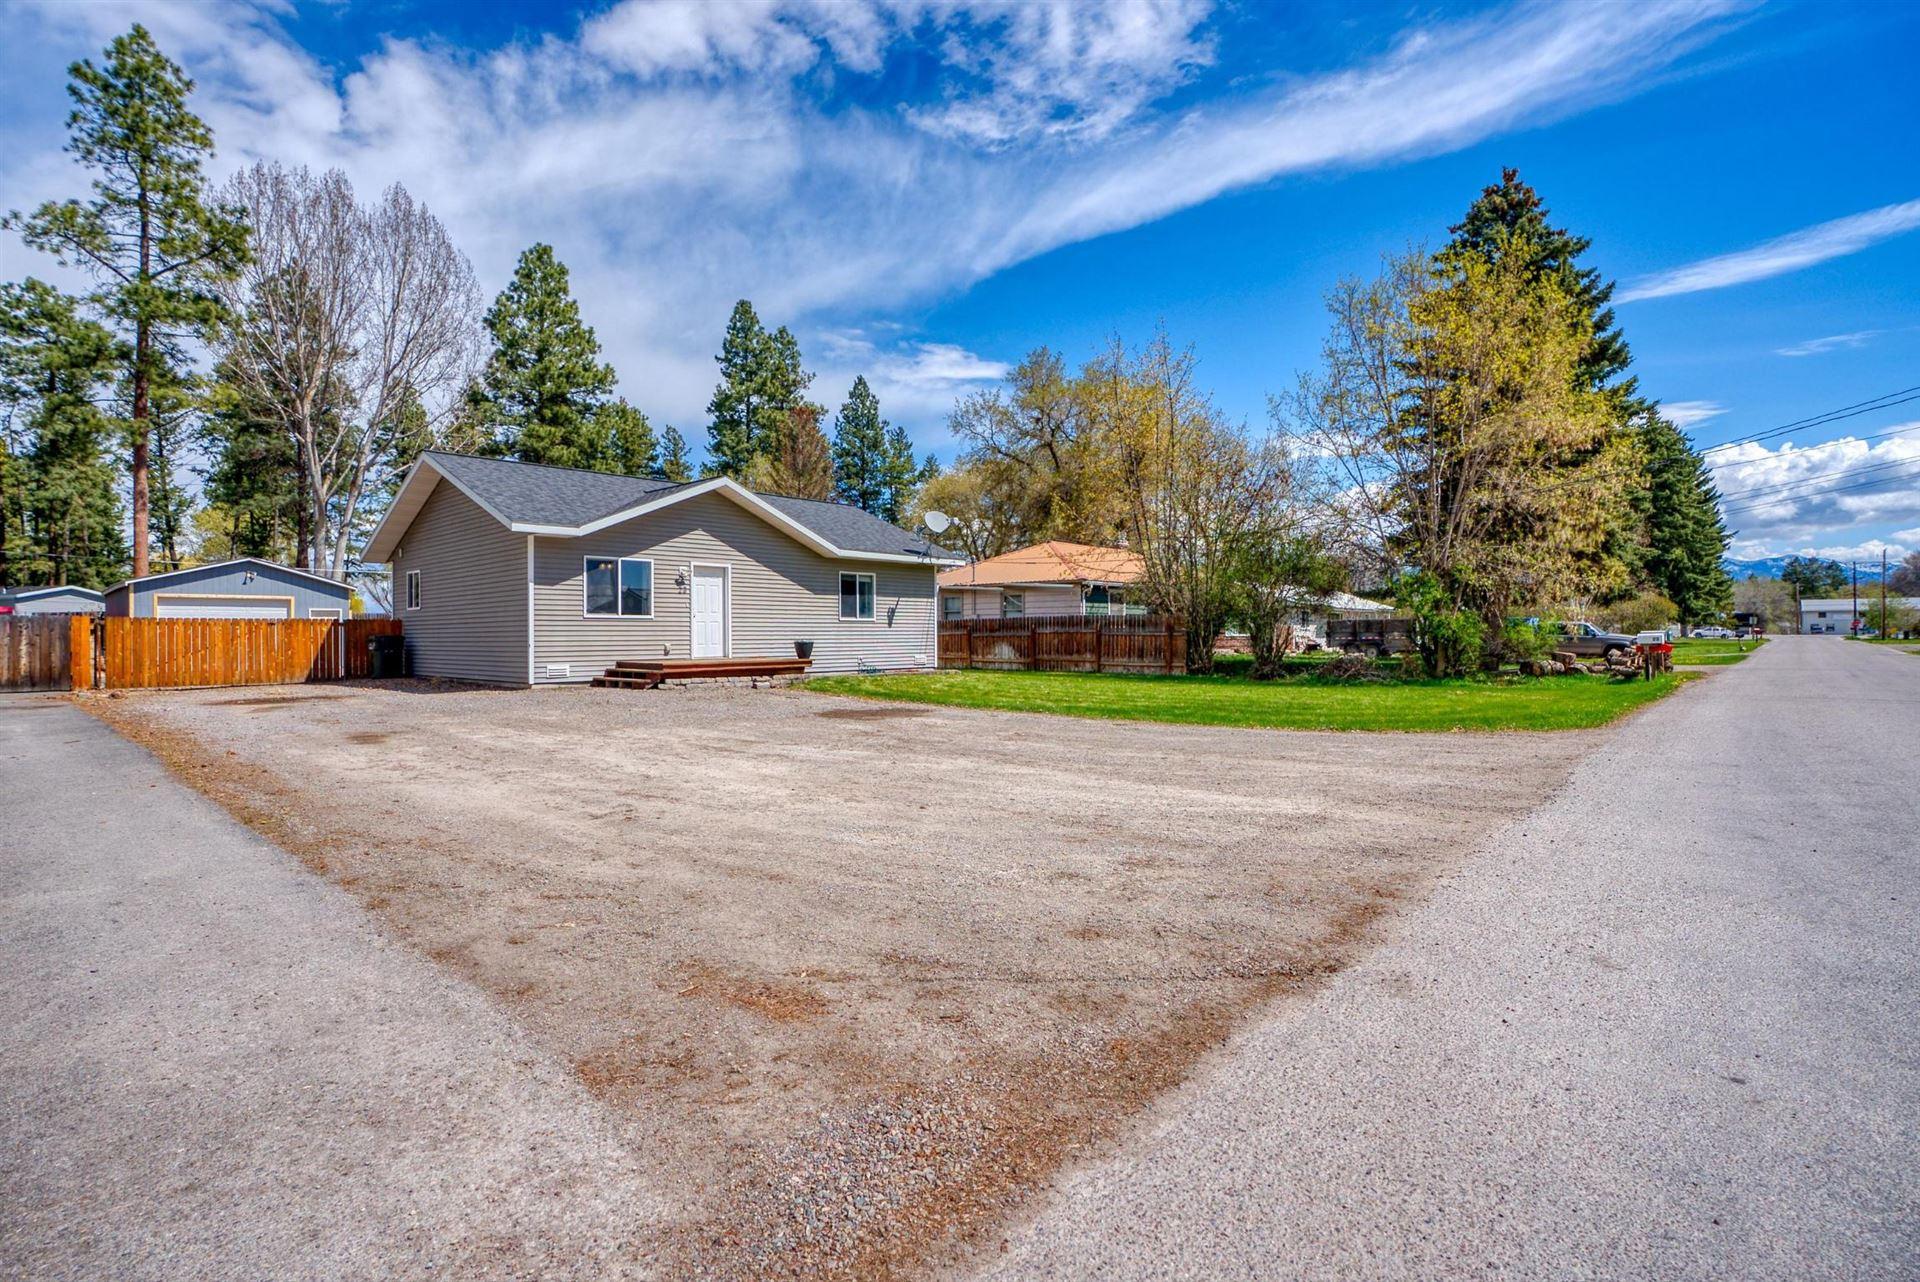 Photo of 23 Meadowlark Drive, Kalispell, MT 59901 (MLS # 22106380)